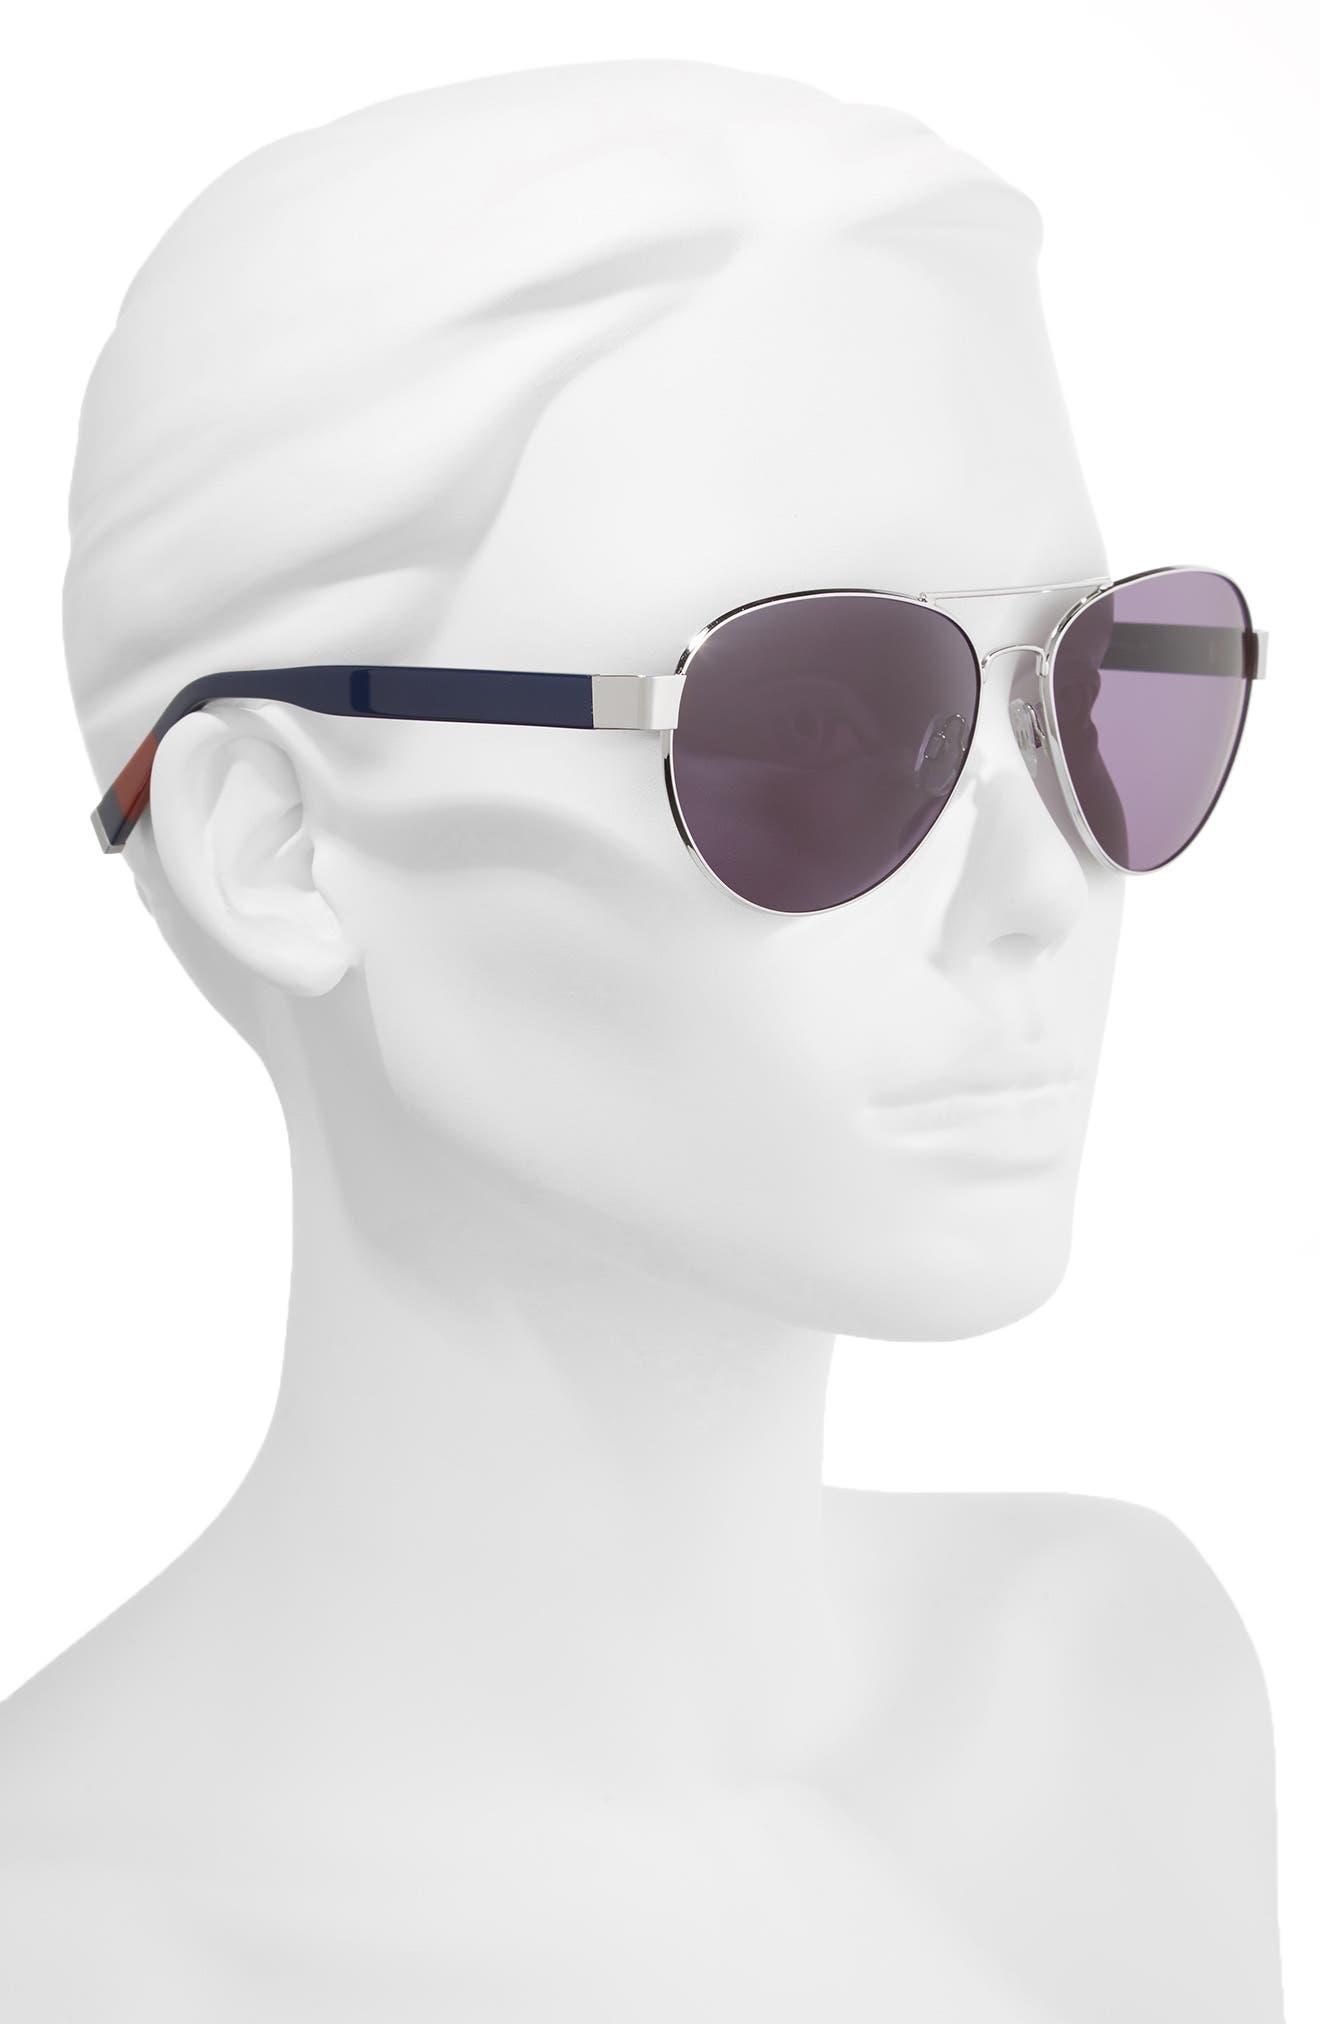 62mm Oversize Aviator Sunglasses,                             Alternate thumbnail 2, color,                             SILVER BLUE